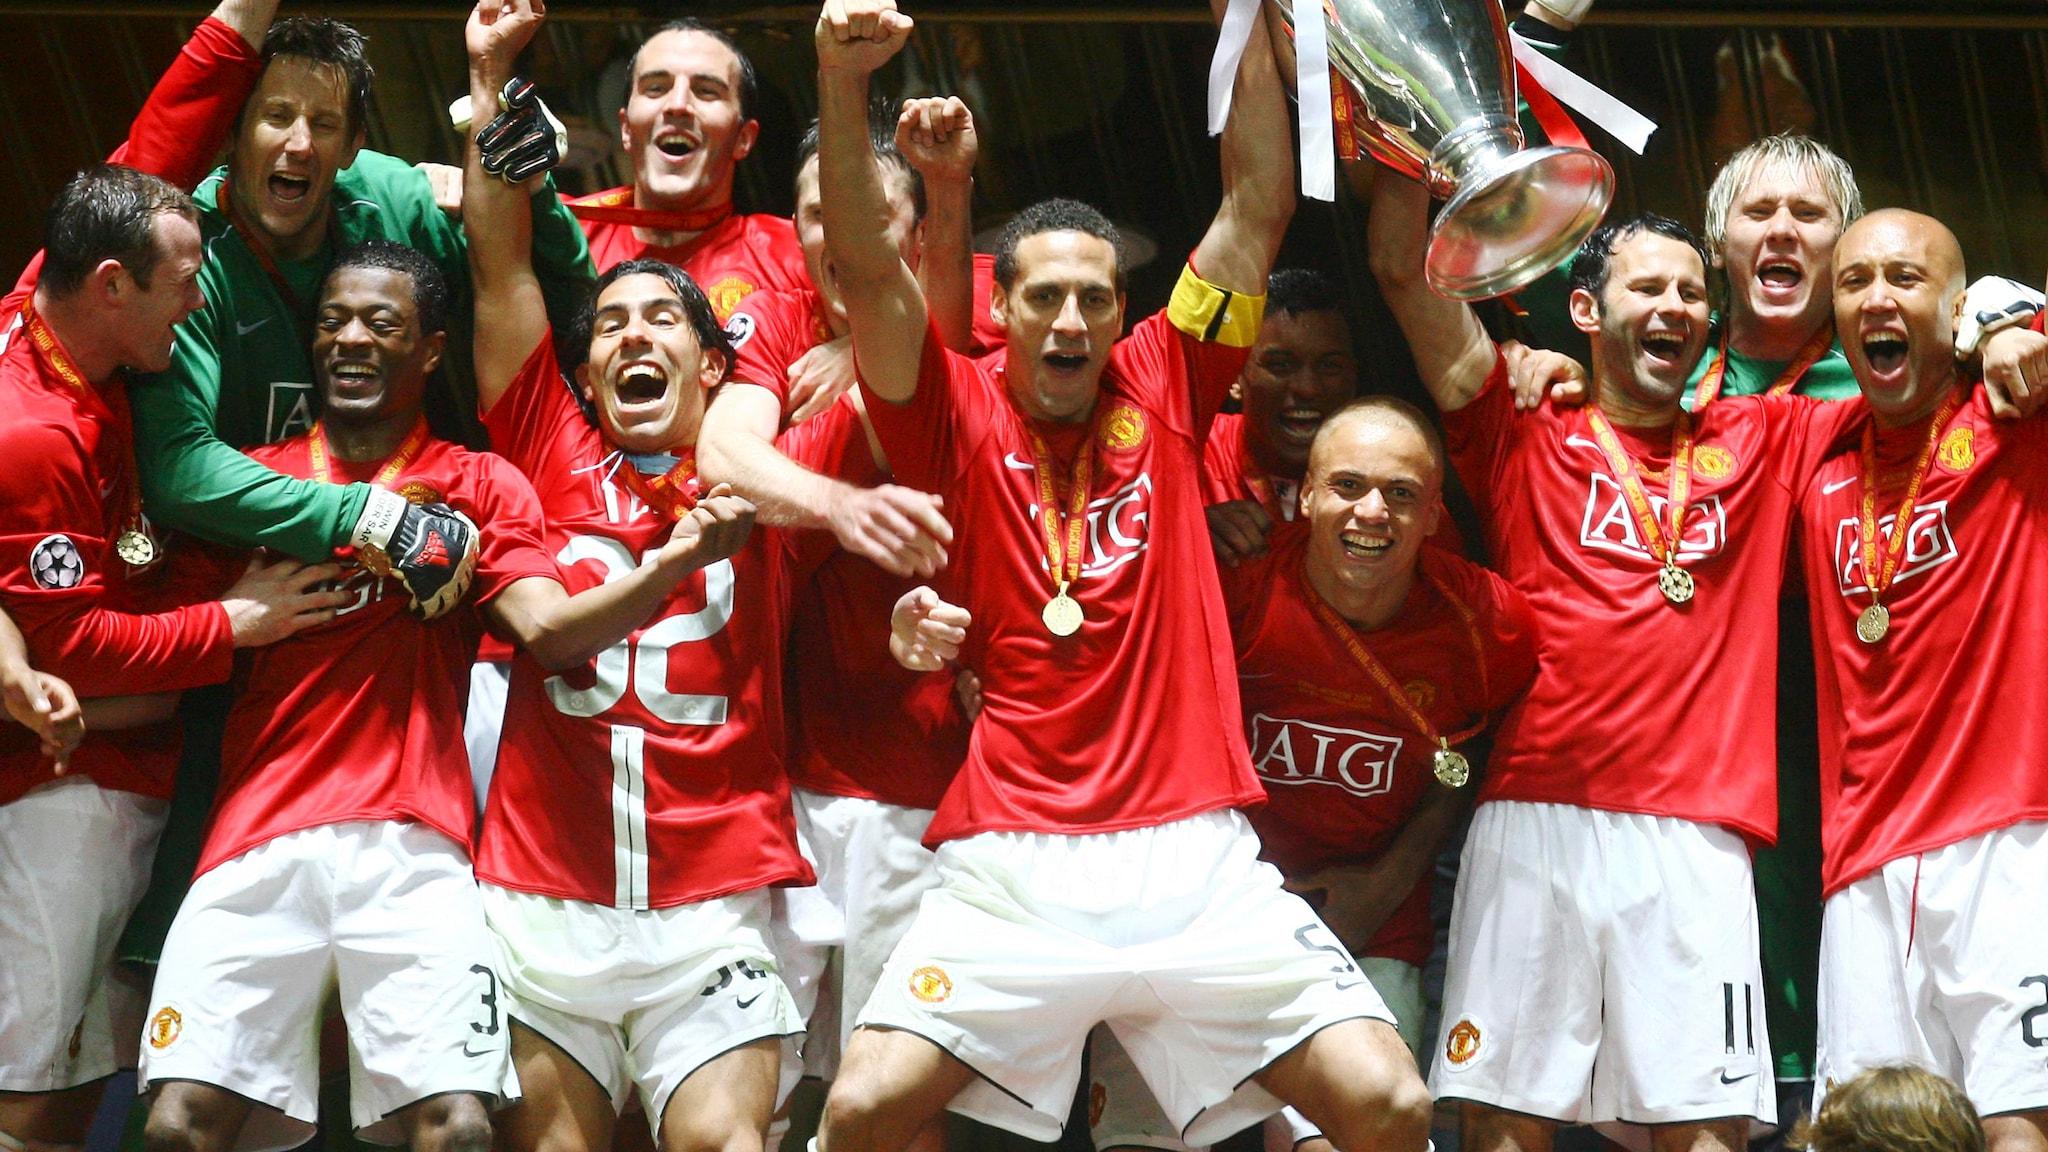 2007/08 Manchester United FC 1-1 Chelsea FC (6-5 on pens): Report   UEFA Champions League   UEFA.com